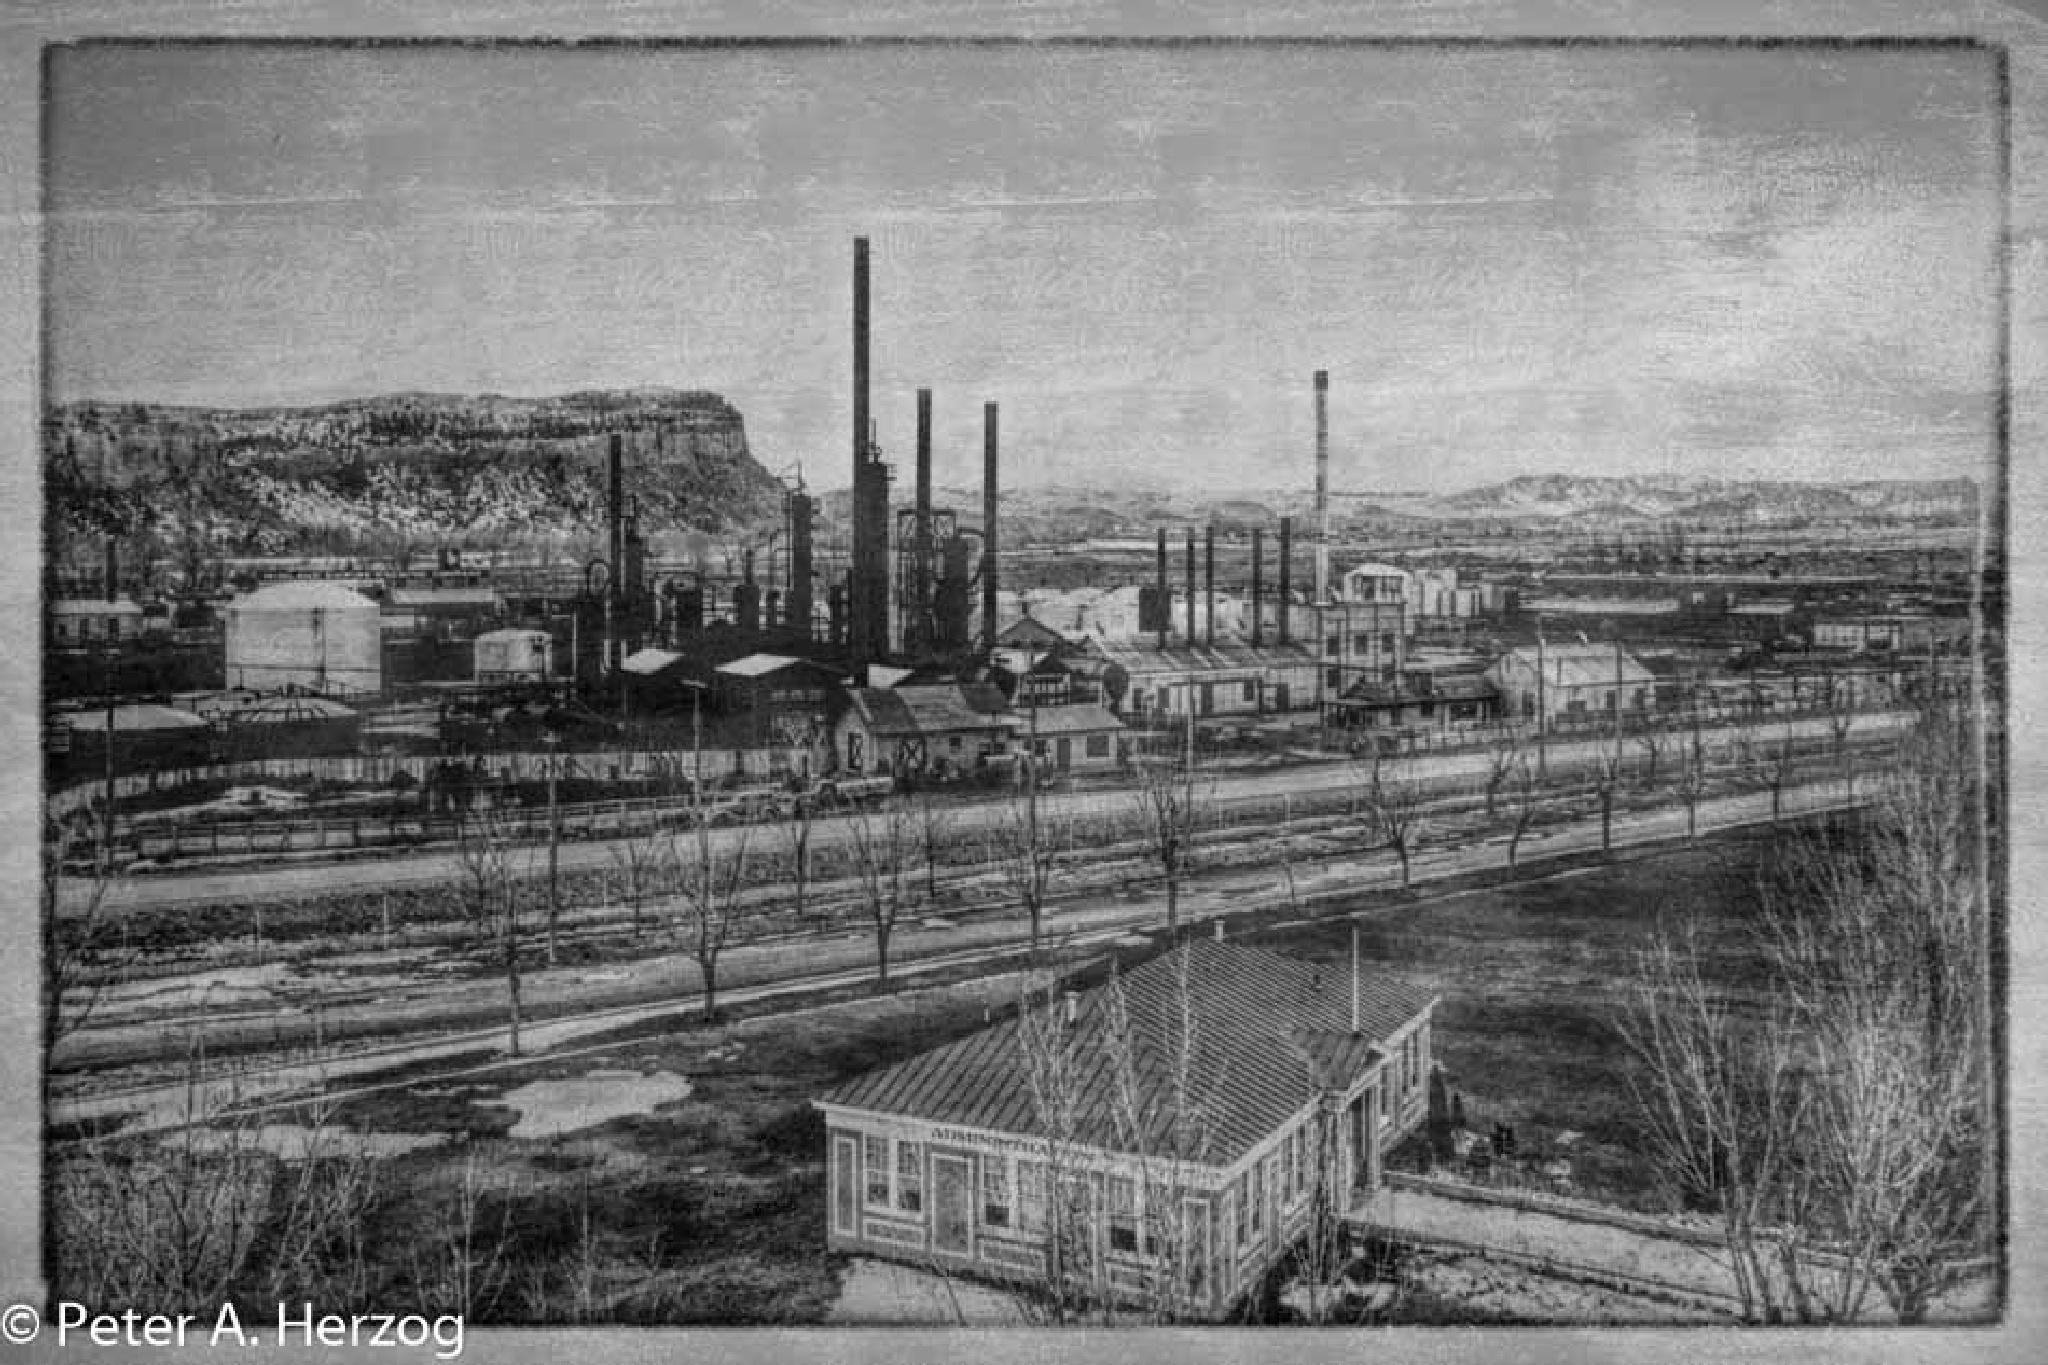 Yale Refinery Billings Montana 1947 by peter.herzog.3323